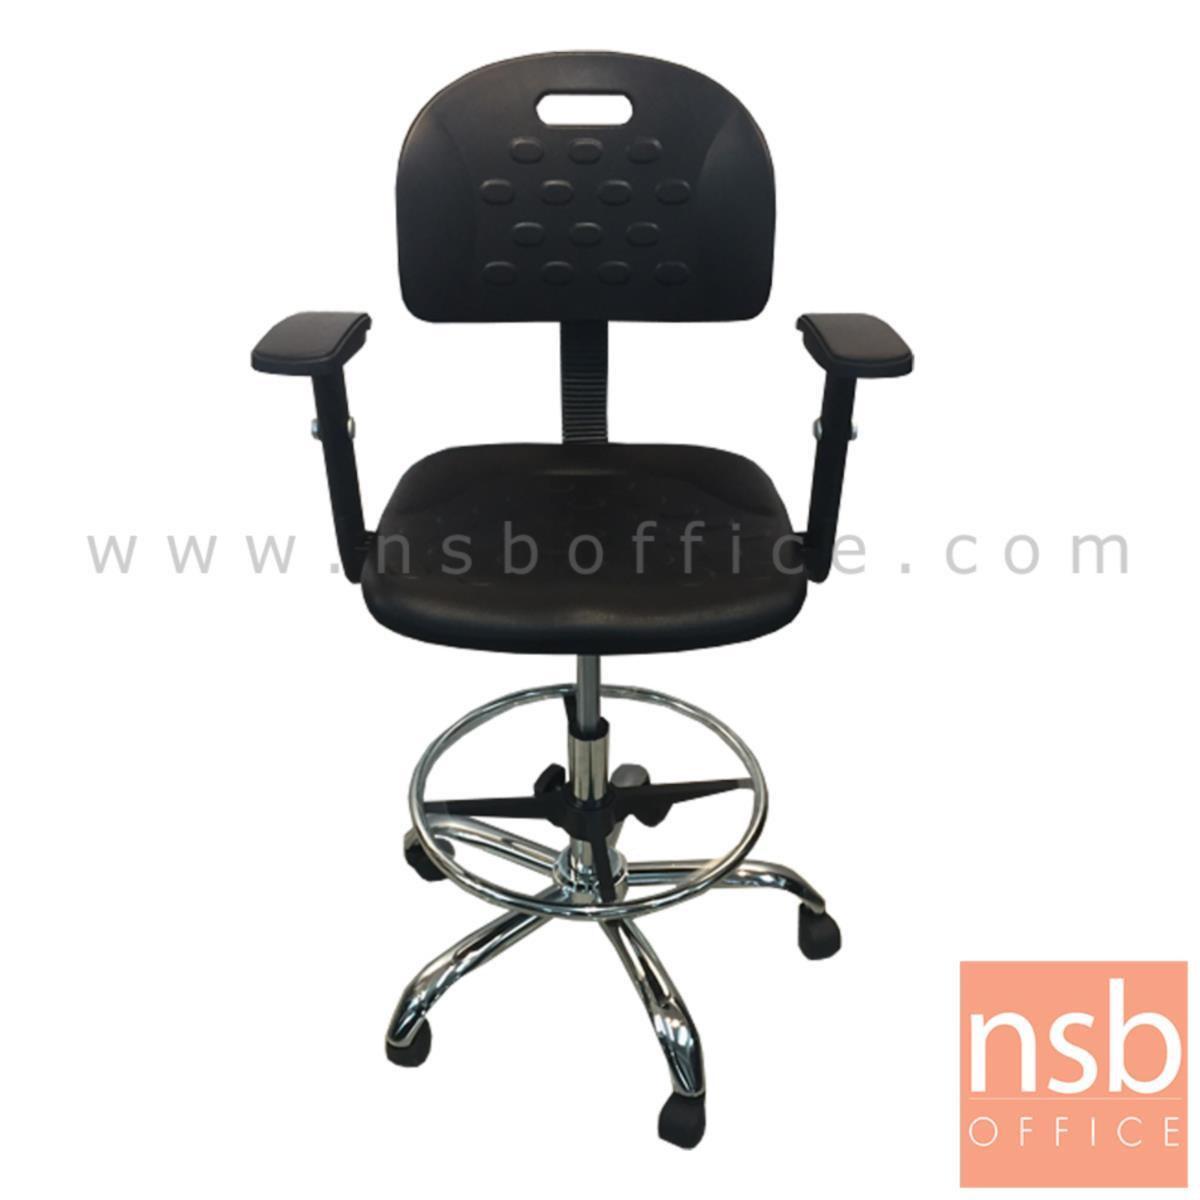 B09A194:เก้าอี้บาร์ที่นั่งเหลี่ยมล้อเลื่อน รุ่น Routh (เราธ์)  โช๊คแก๊ส ขาเหล็กชุบโครเมี่ยม